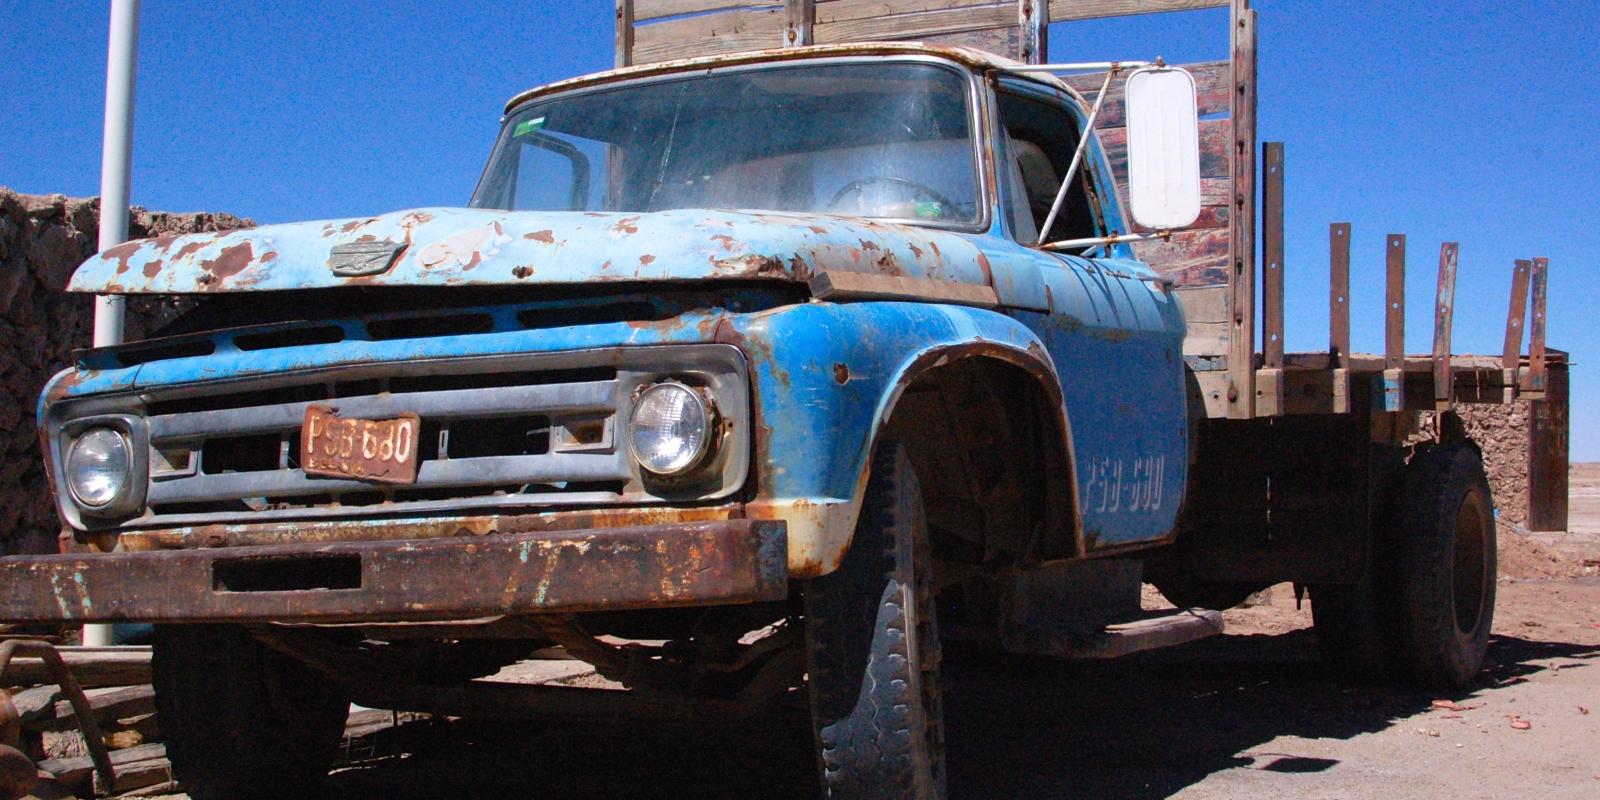 Old truck in Salar de Uyuni, Bolivia